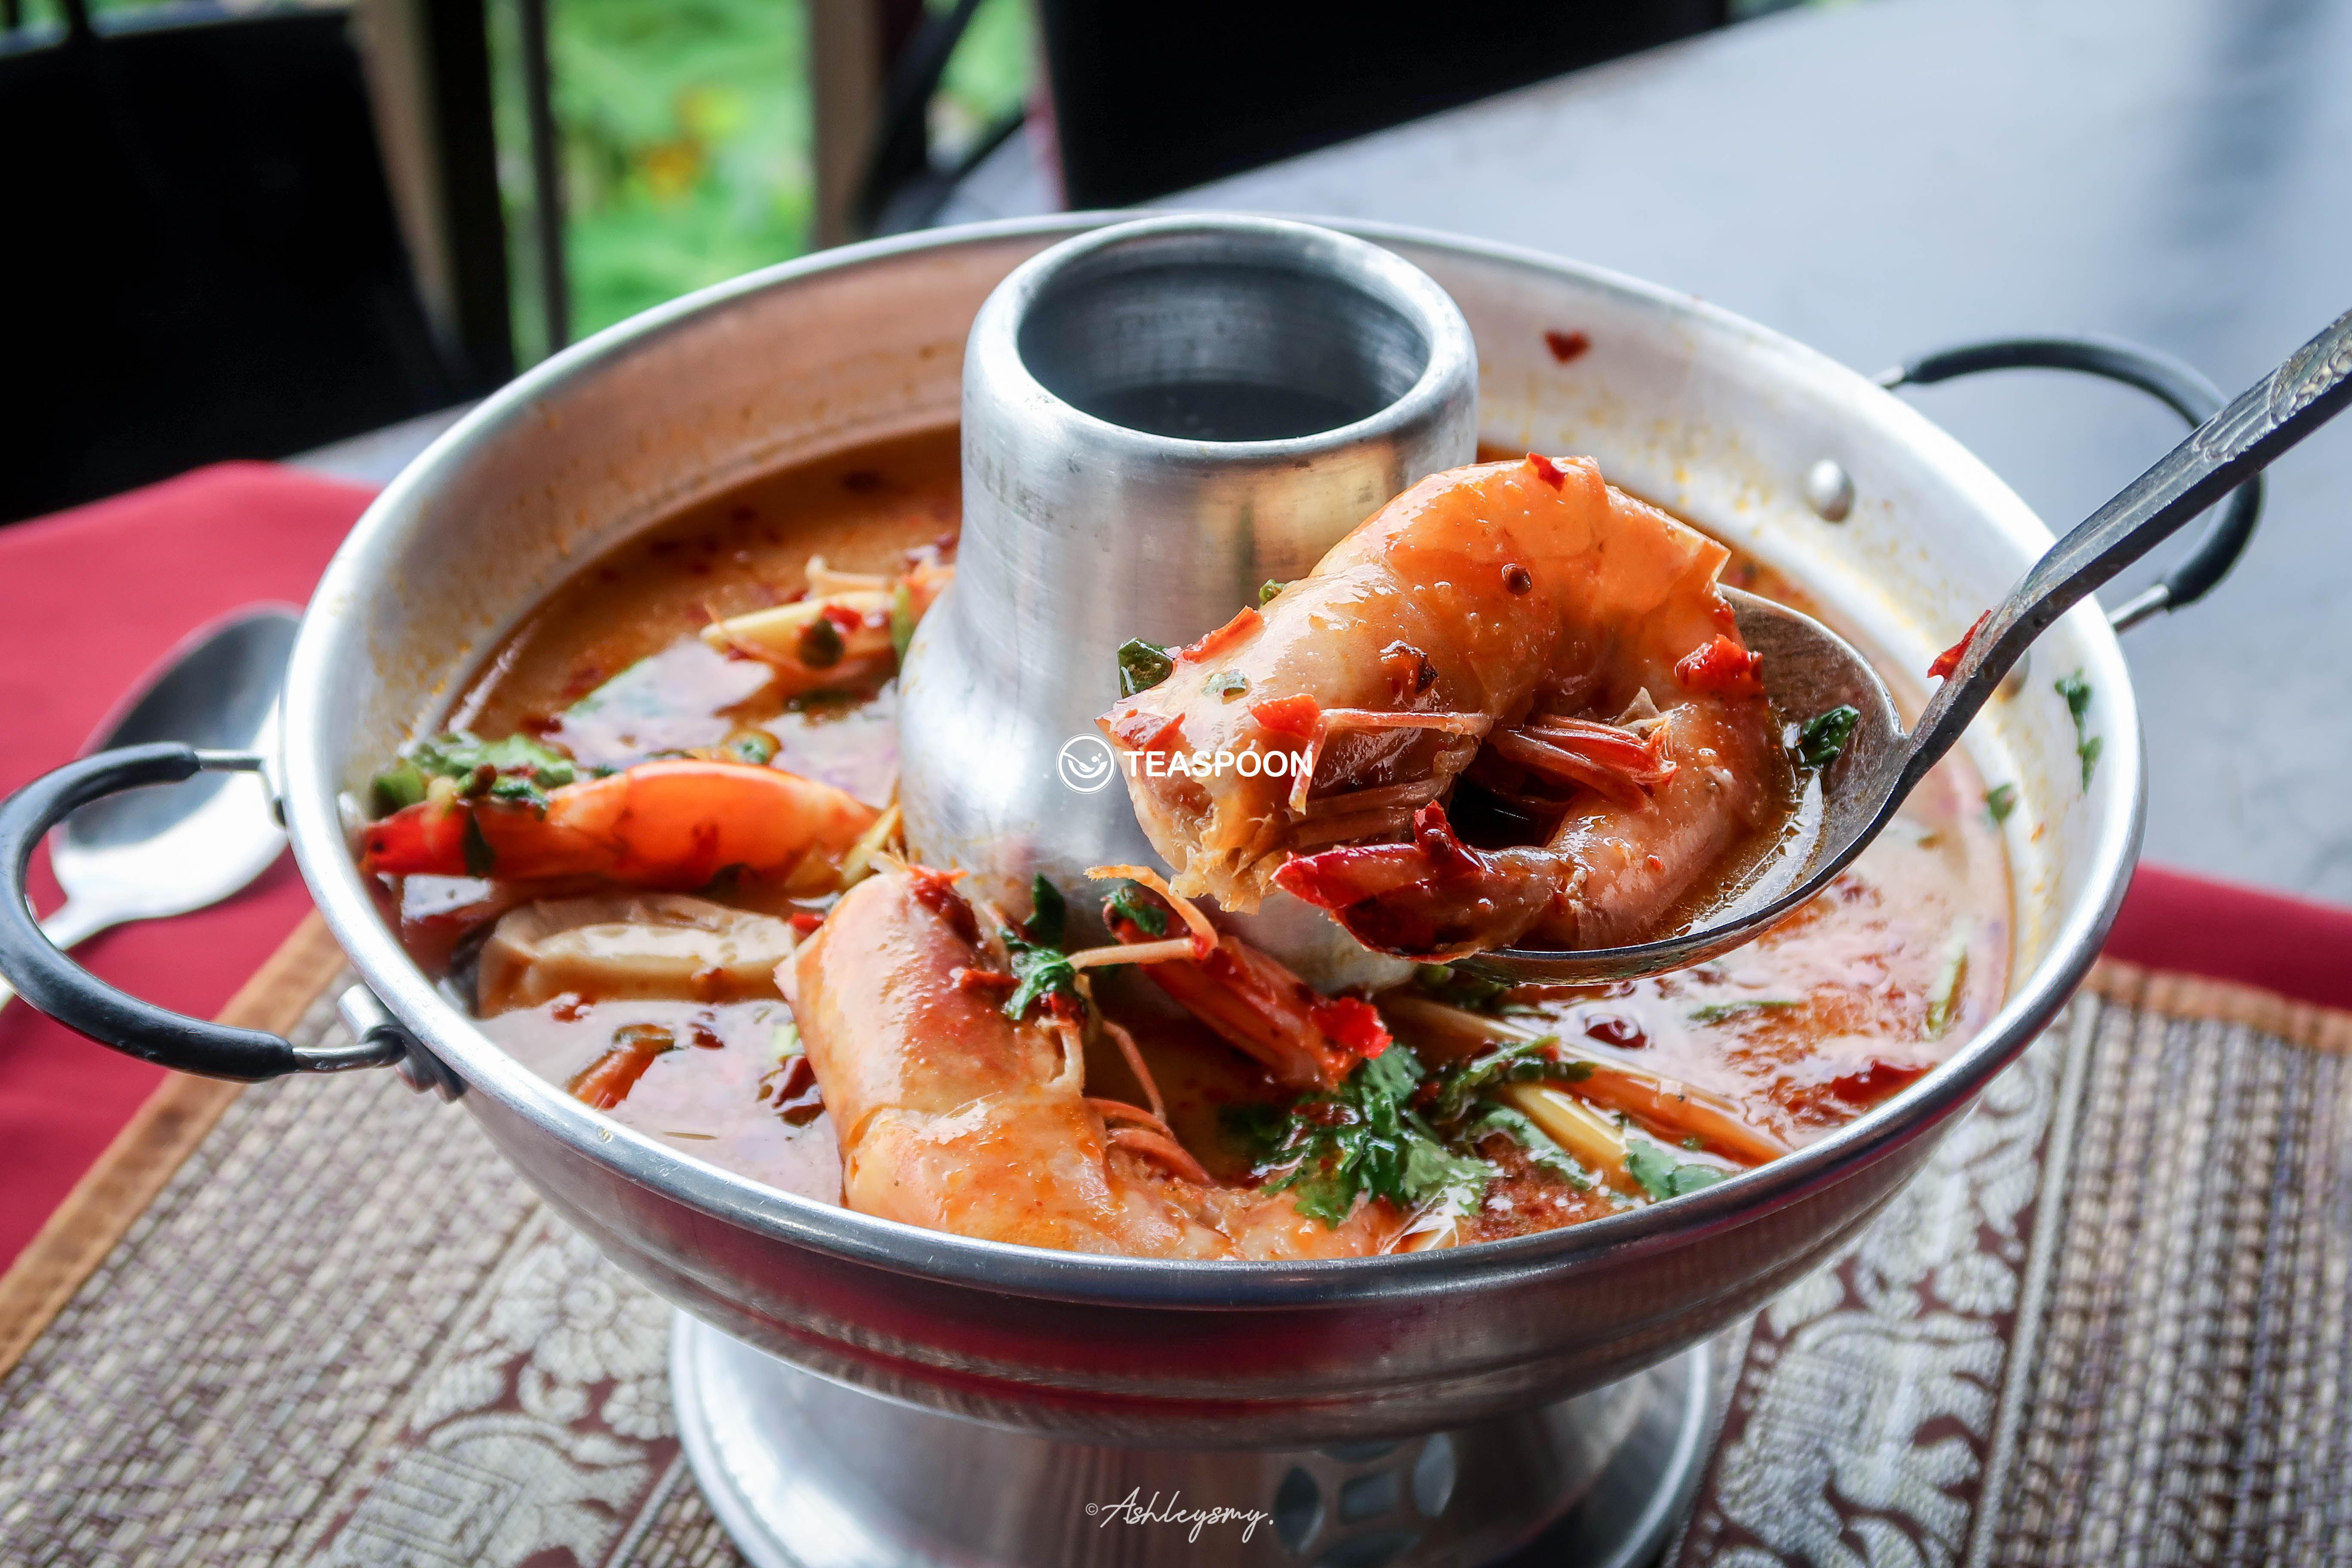 Tomyum Creamy Prawn Soup (Tomyum Nam Khon Kung)